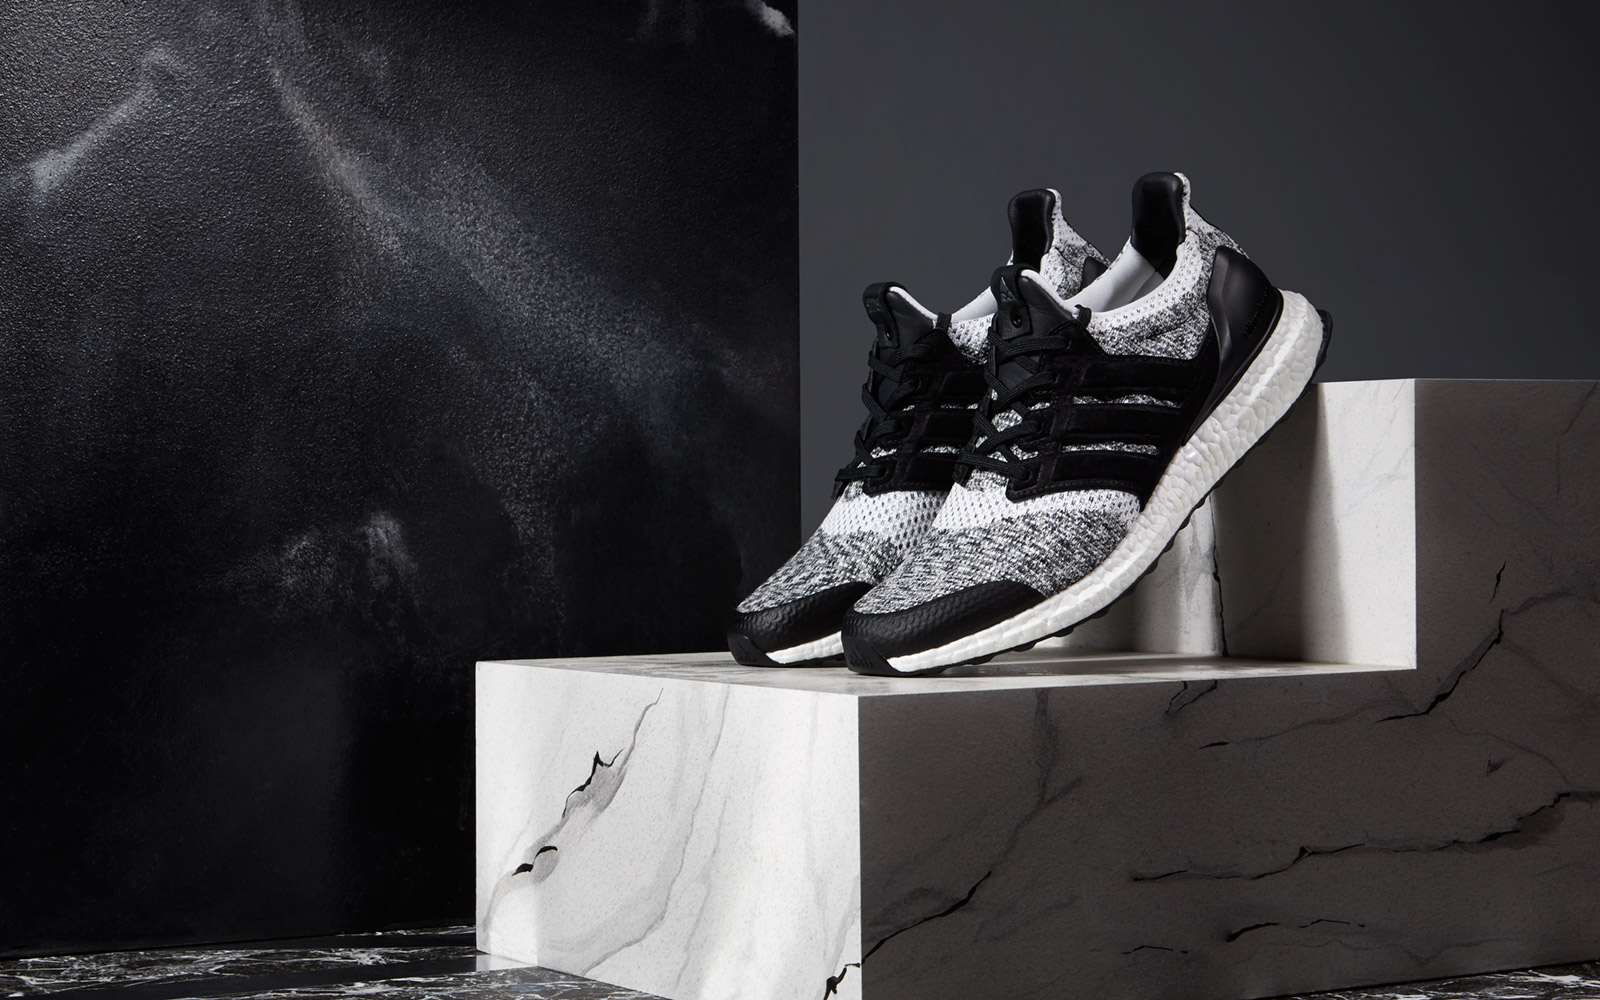 9ca8163107f5 adidas SNS x Social Status UltraBOOST - By2911 - Sneakersnstuff ...